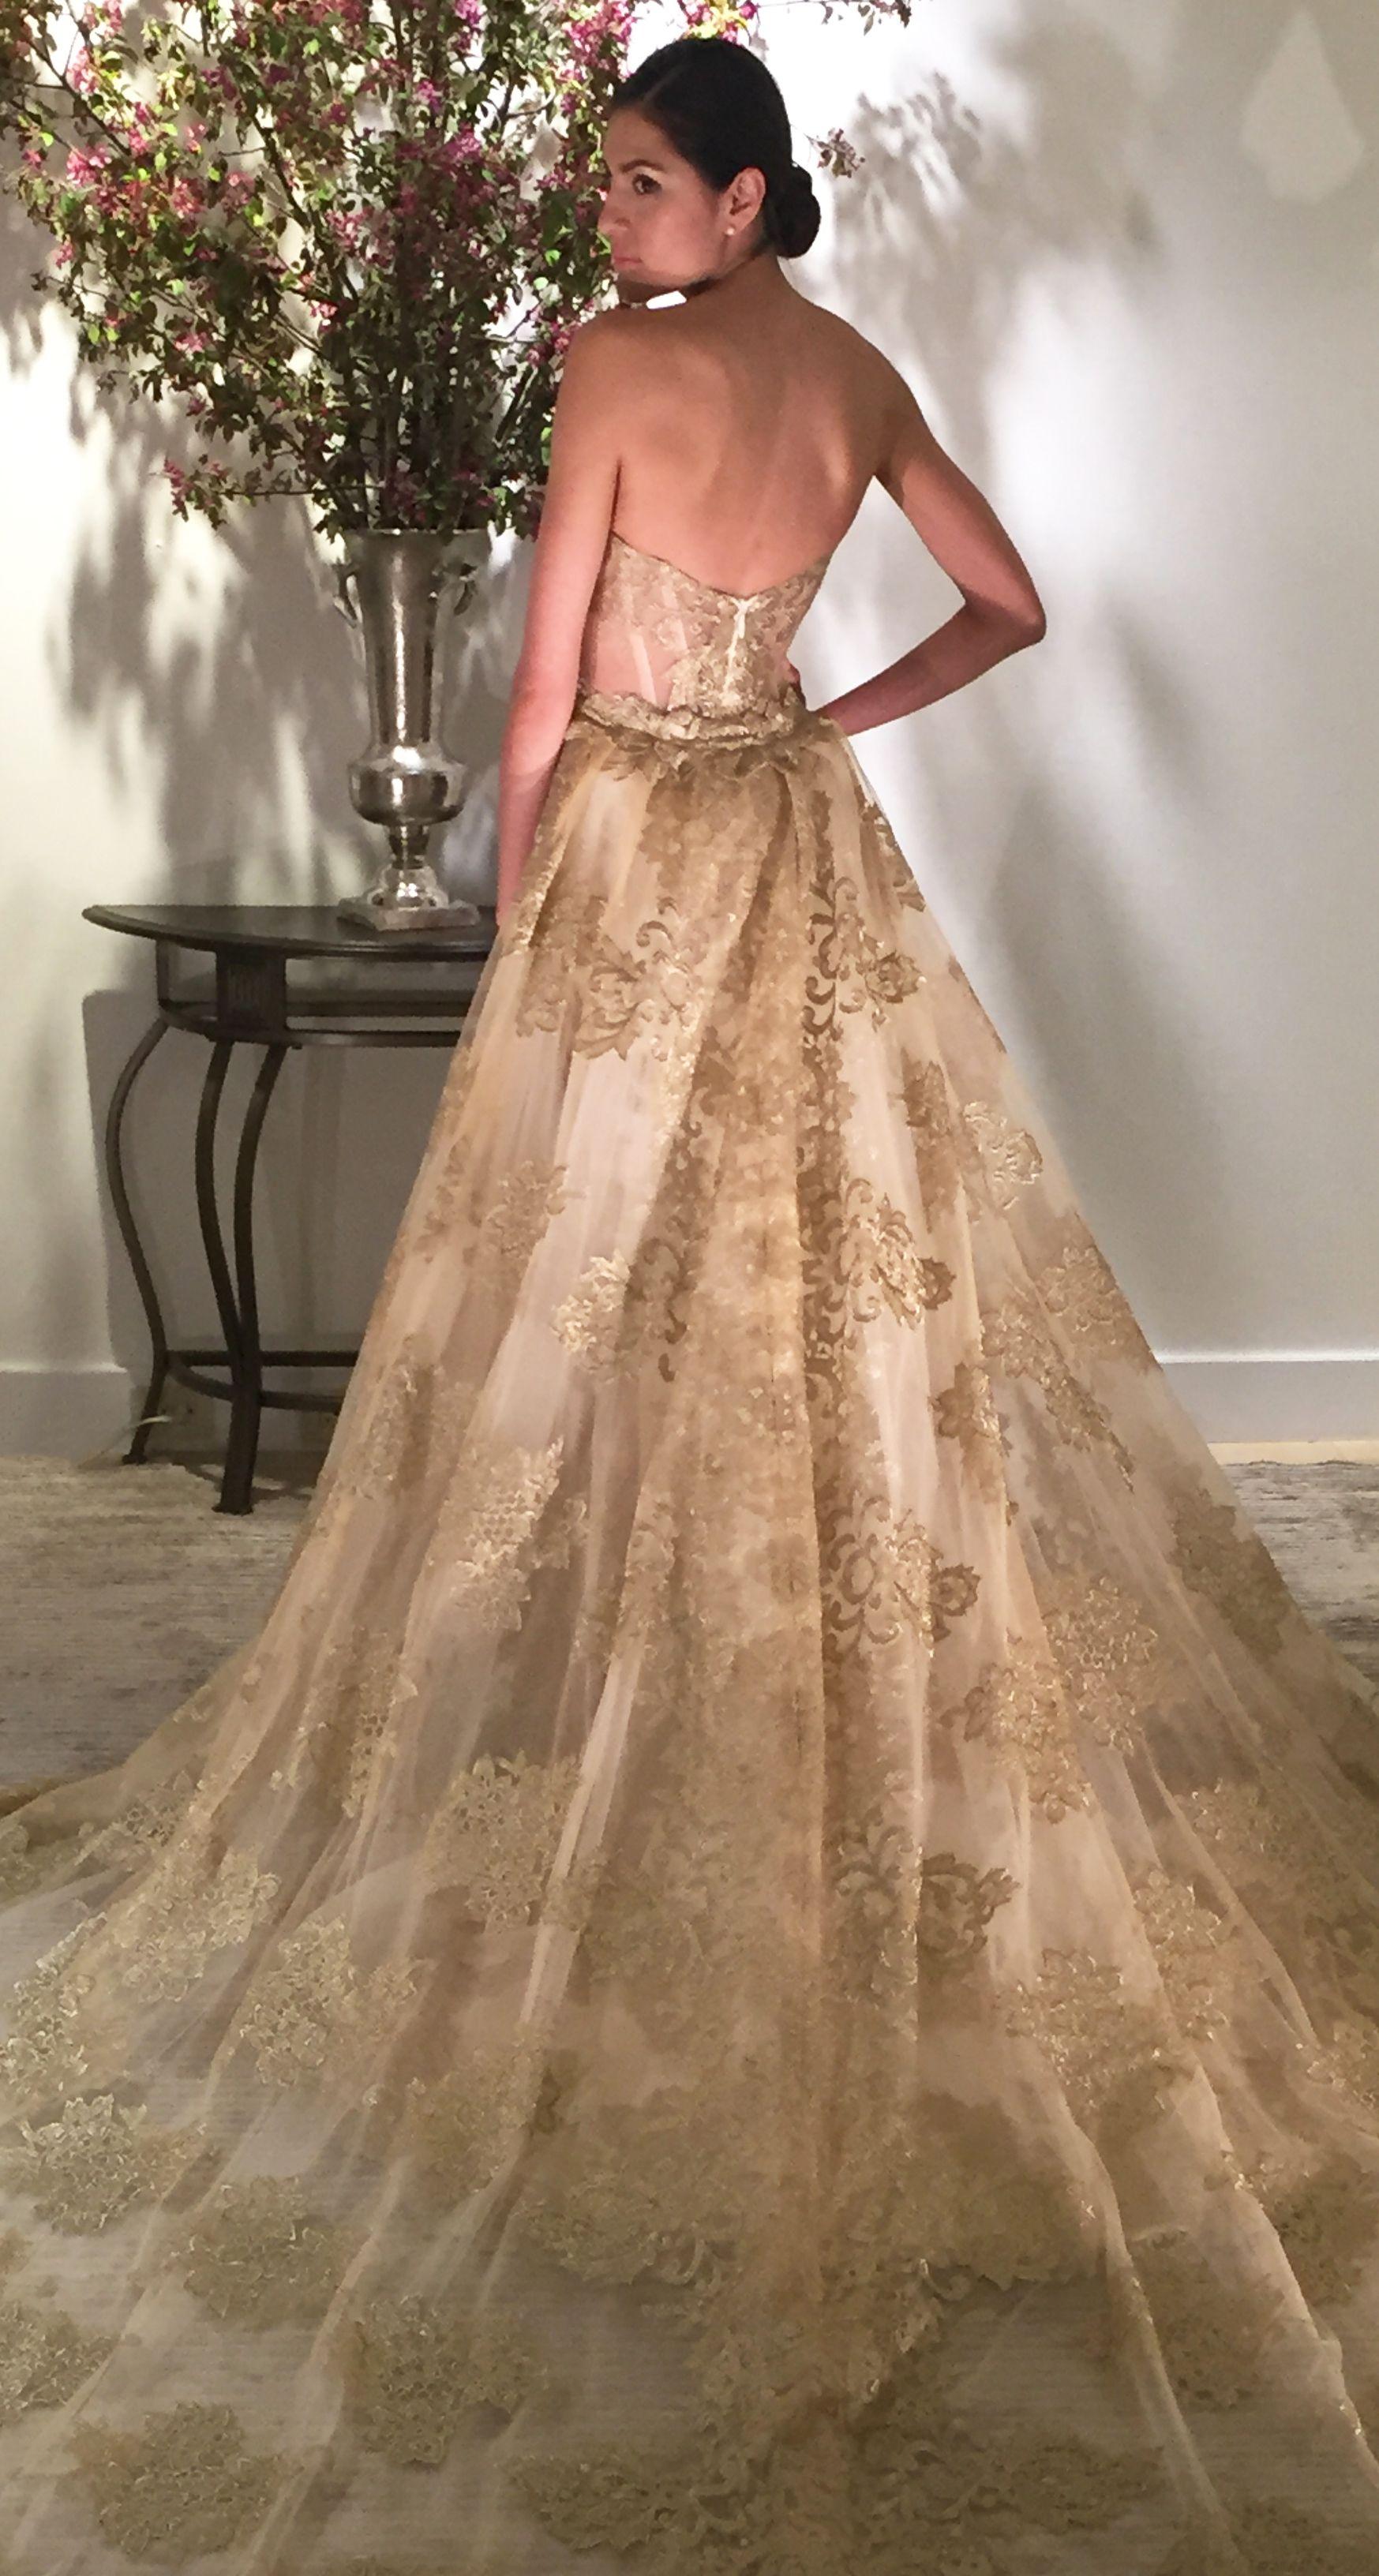 Gold wedding dress by kelly faetanini spring 2017 for Rami kadi wedding dresses prices